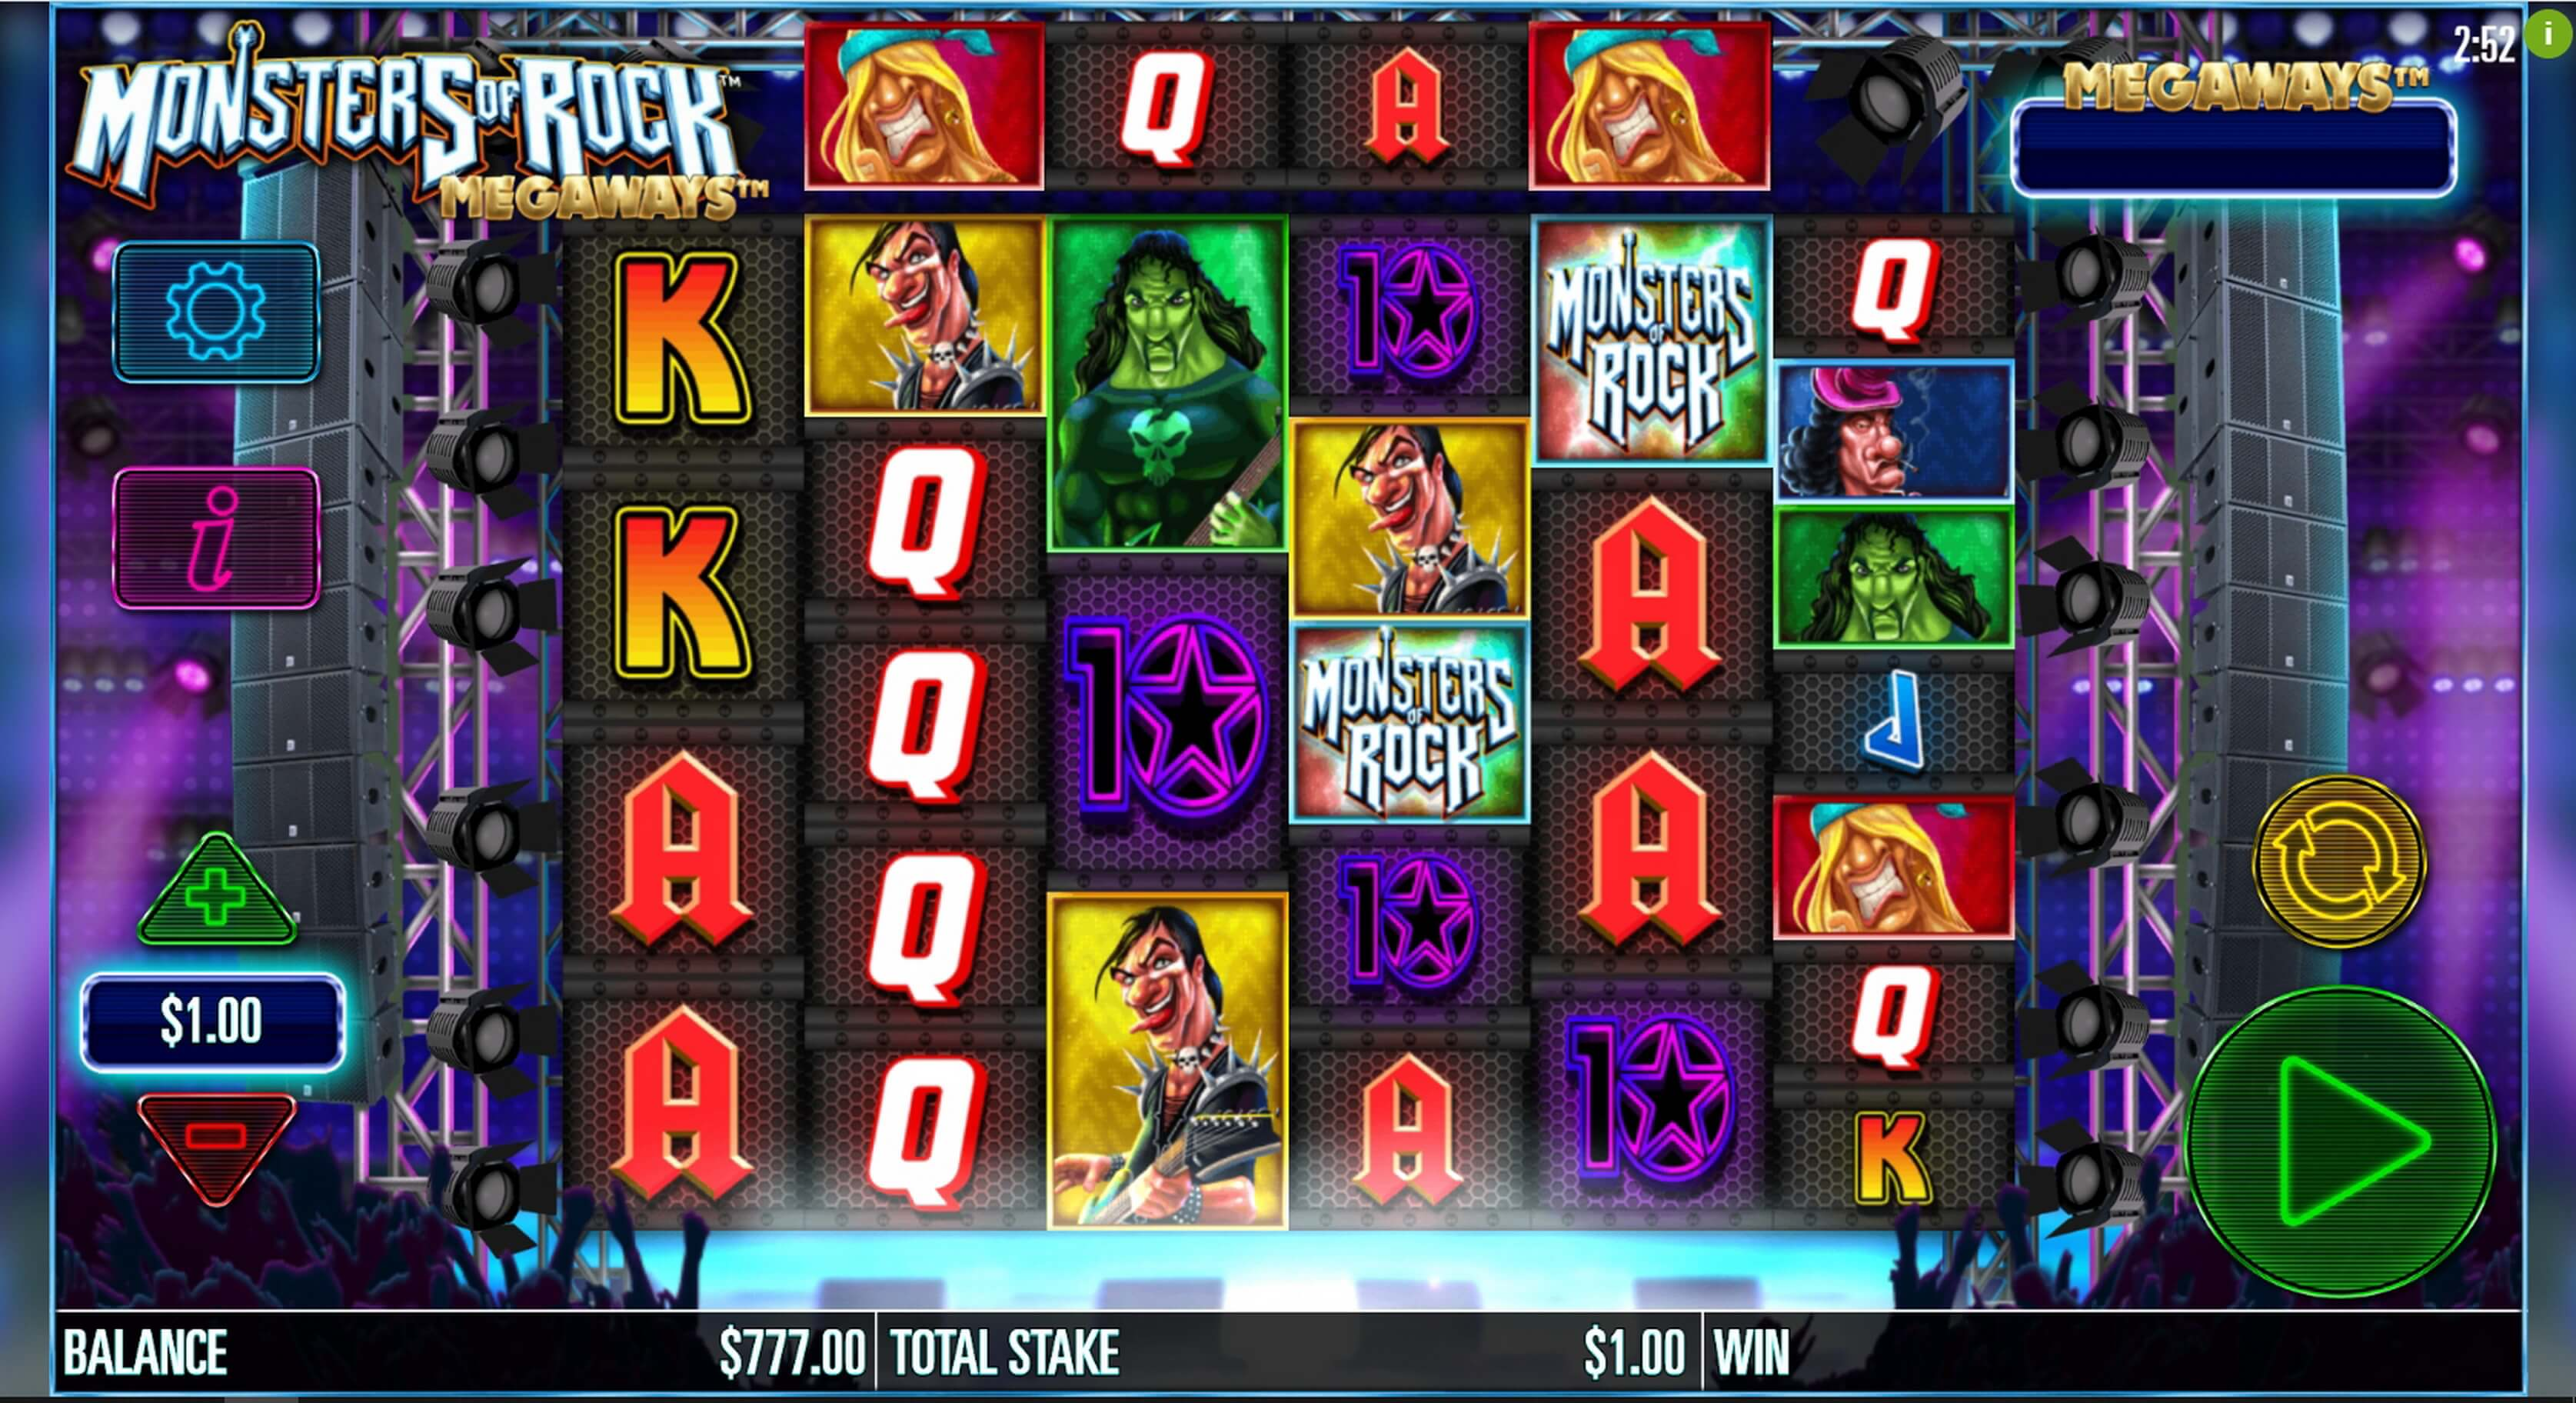 Monsters of Rock Megaways Slot Bonus